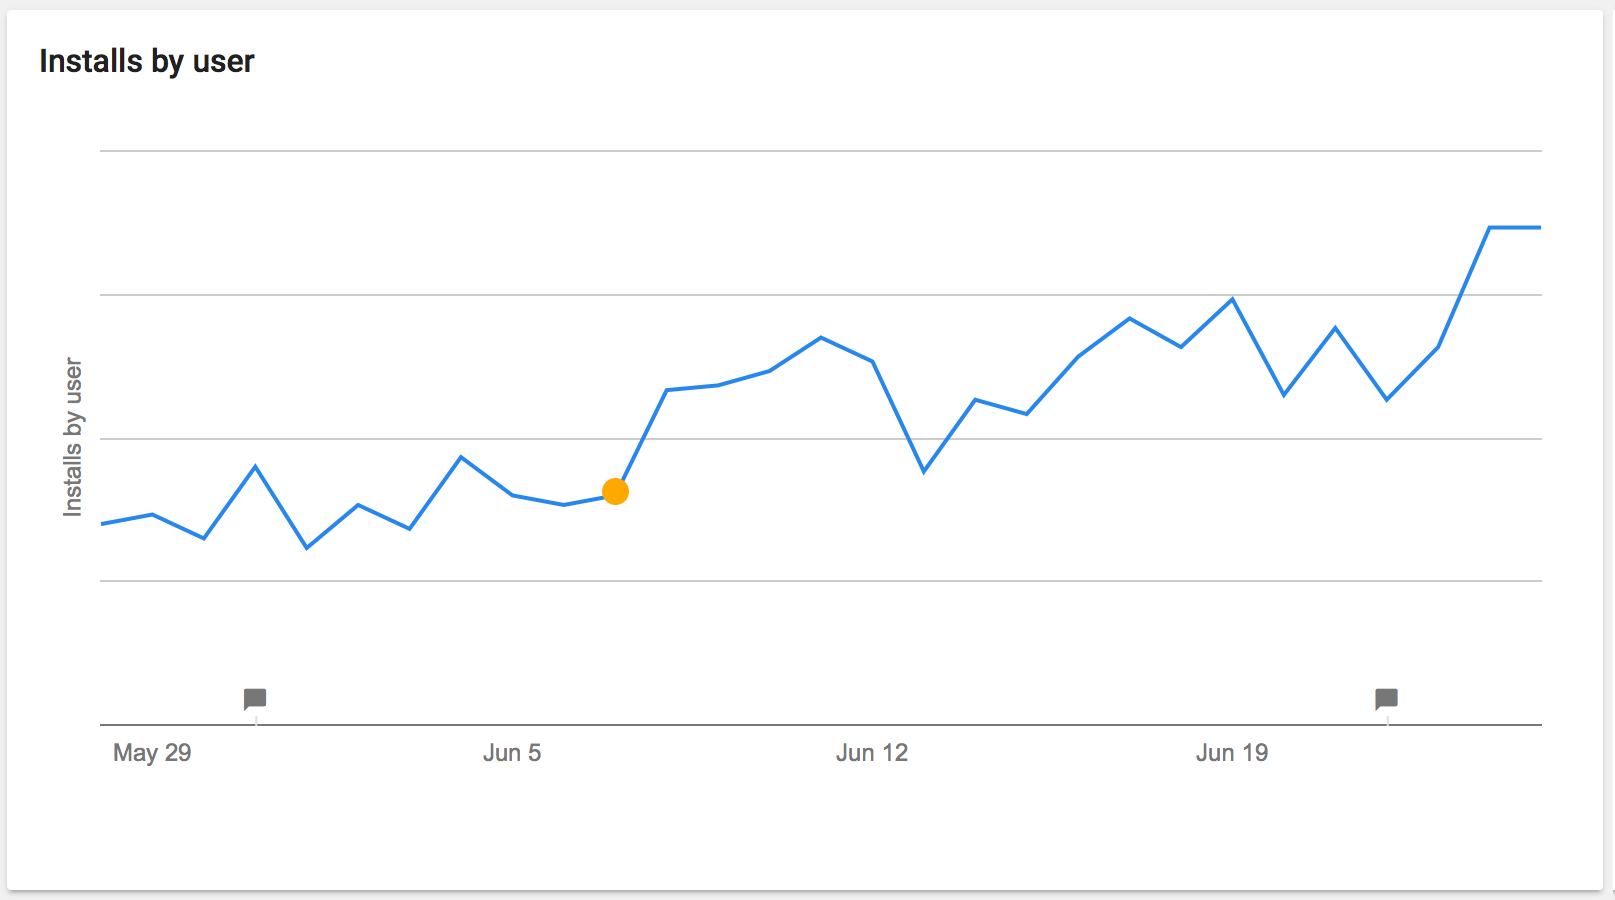 Google Play App Installs Chart